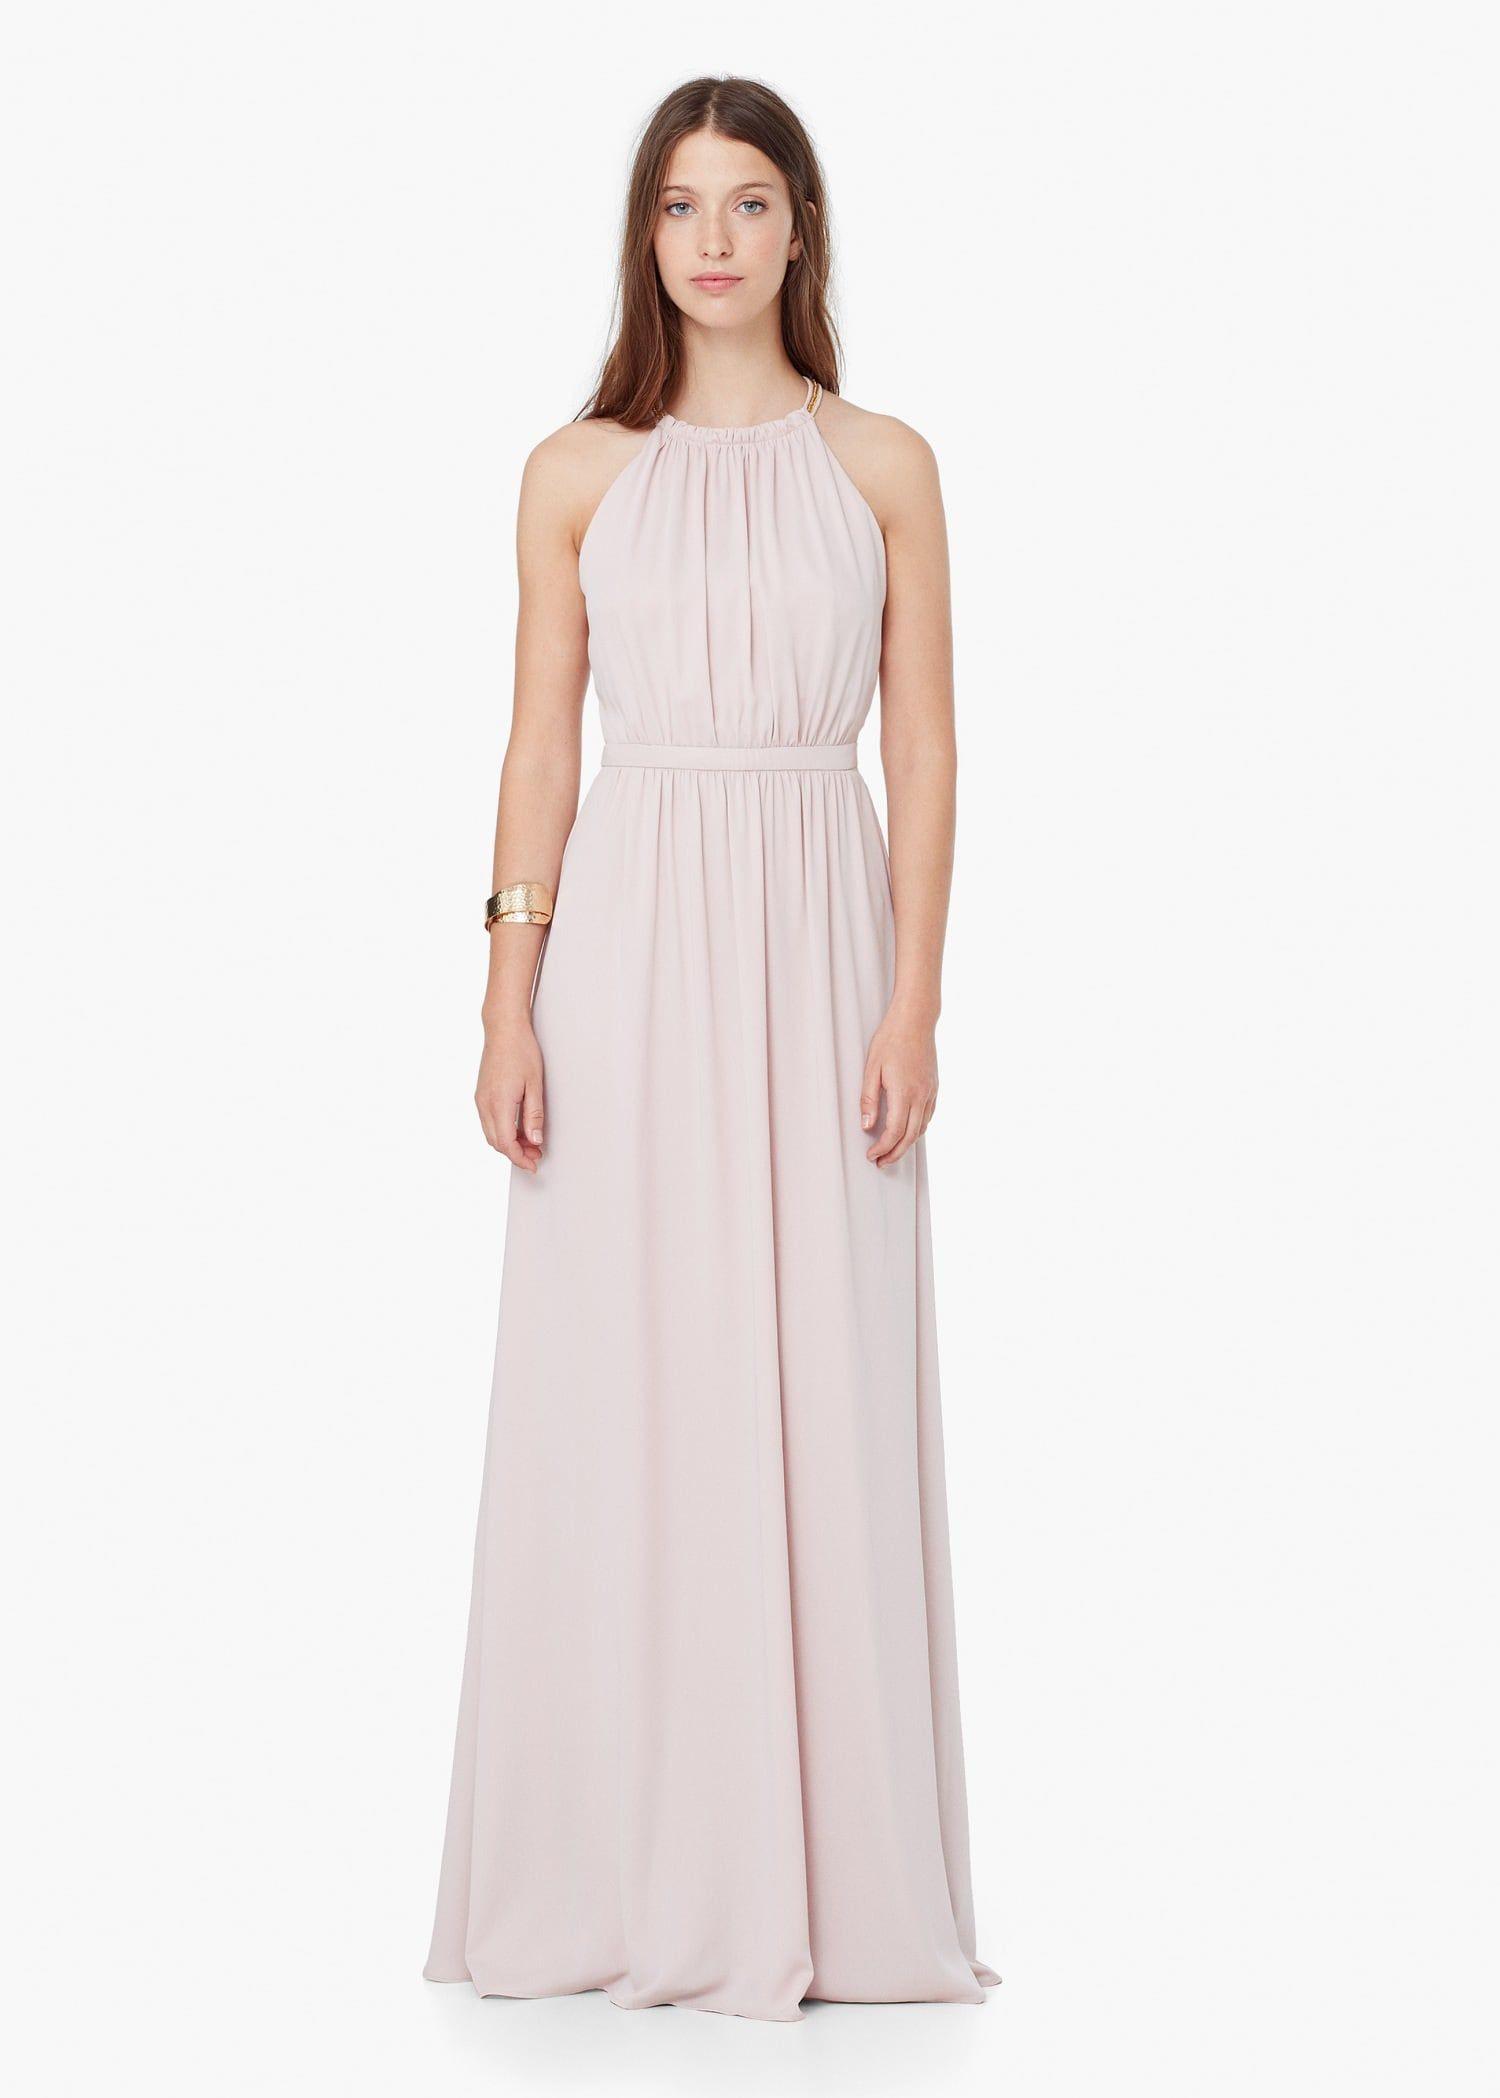 Langes Neckholderkleid  Damen  Neckholder Kleid